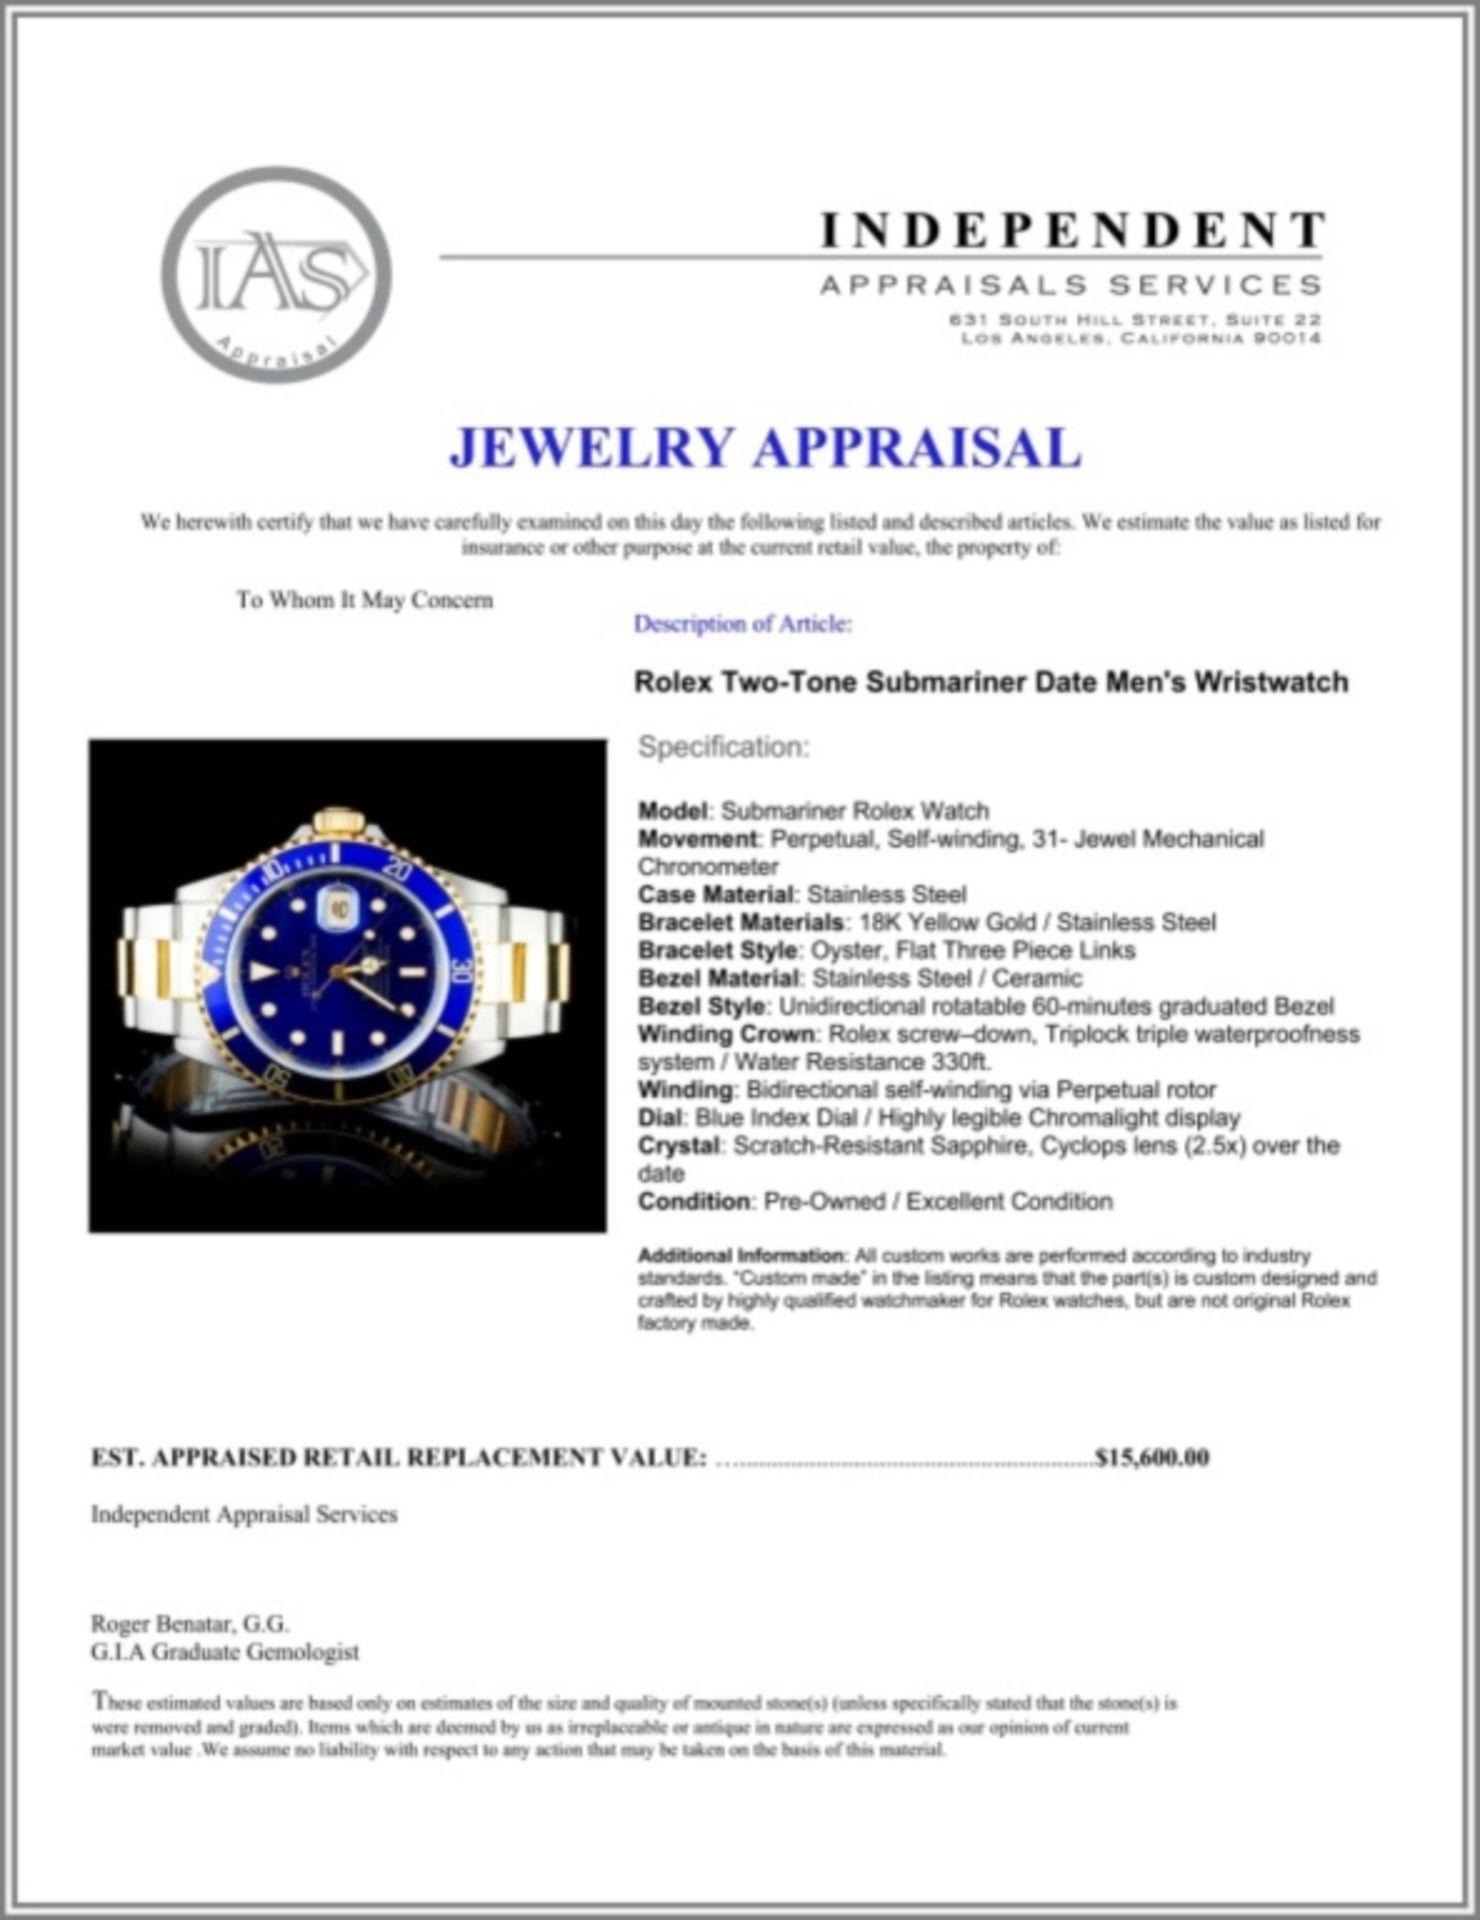 Rolex YG/SS Submariner 40MM Wristwatch - Image 5 of 5